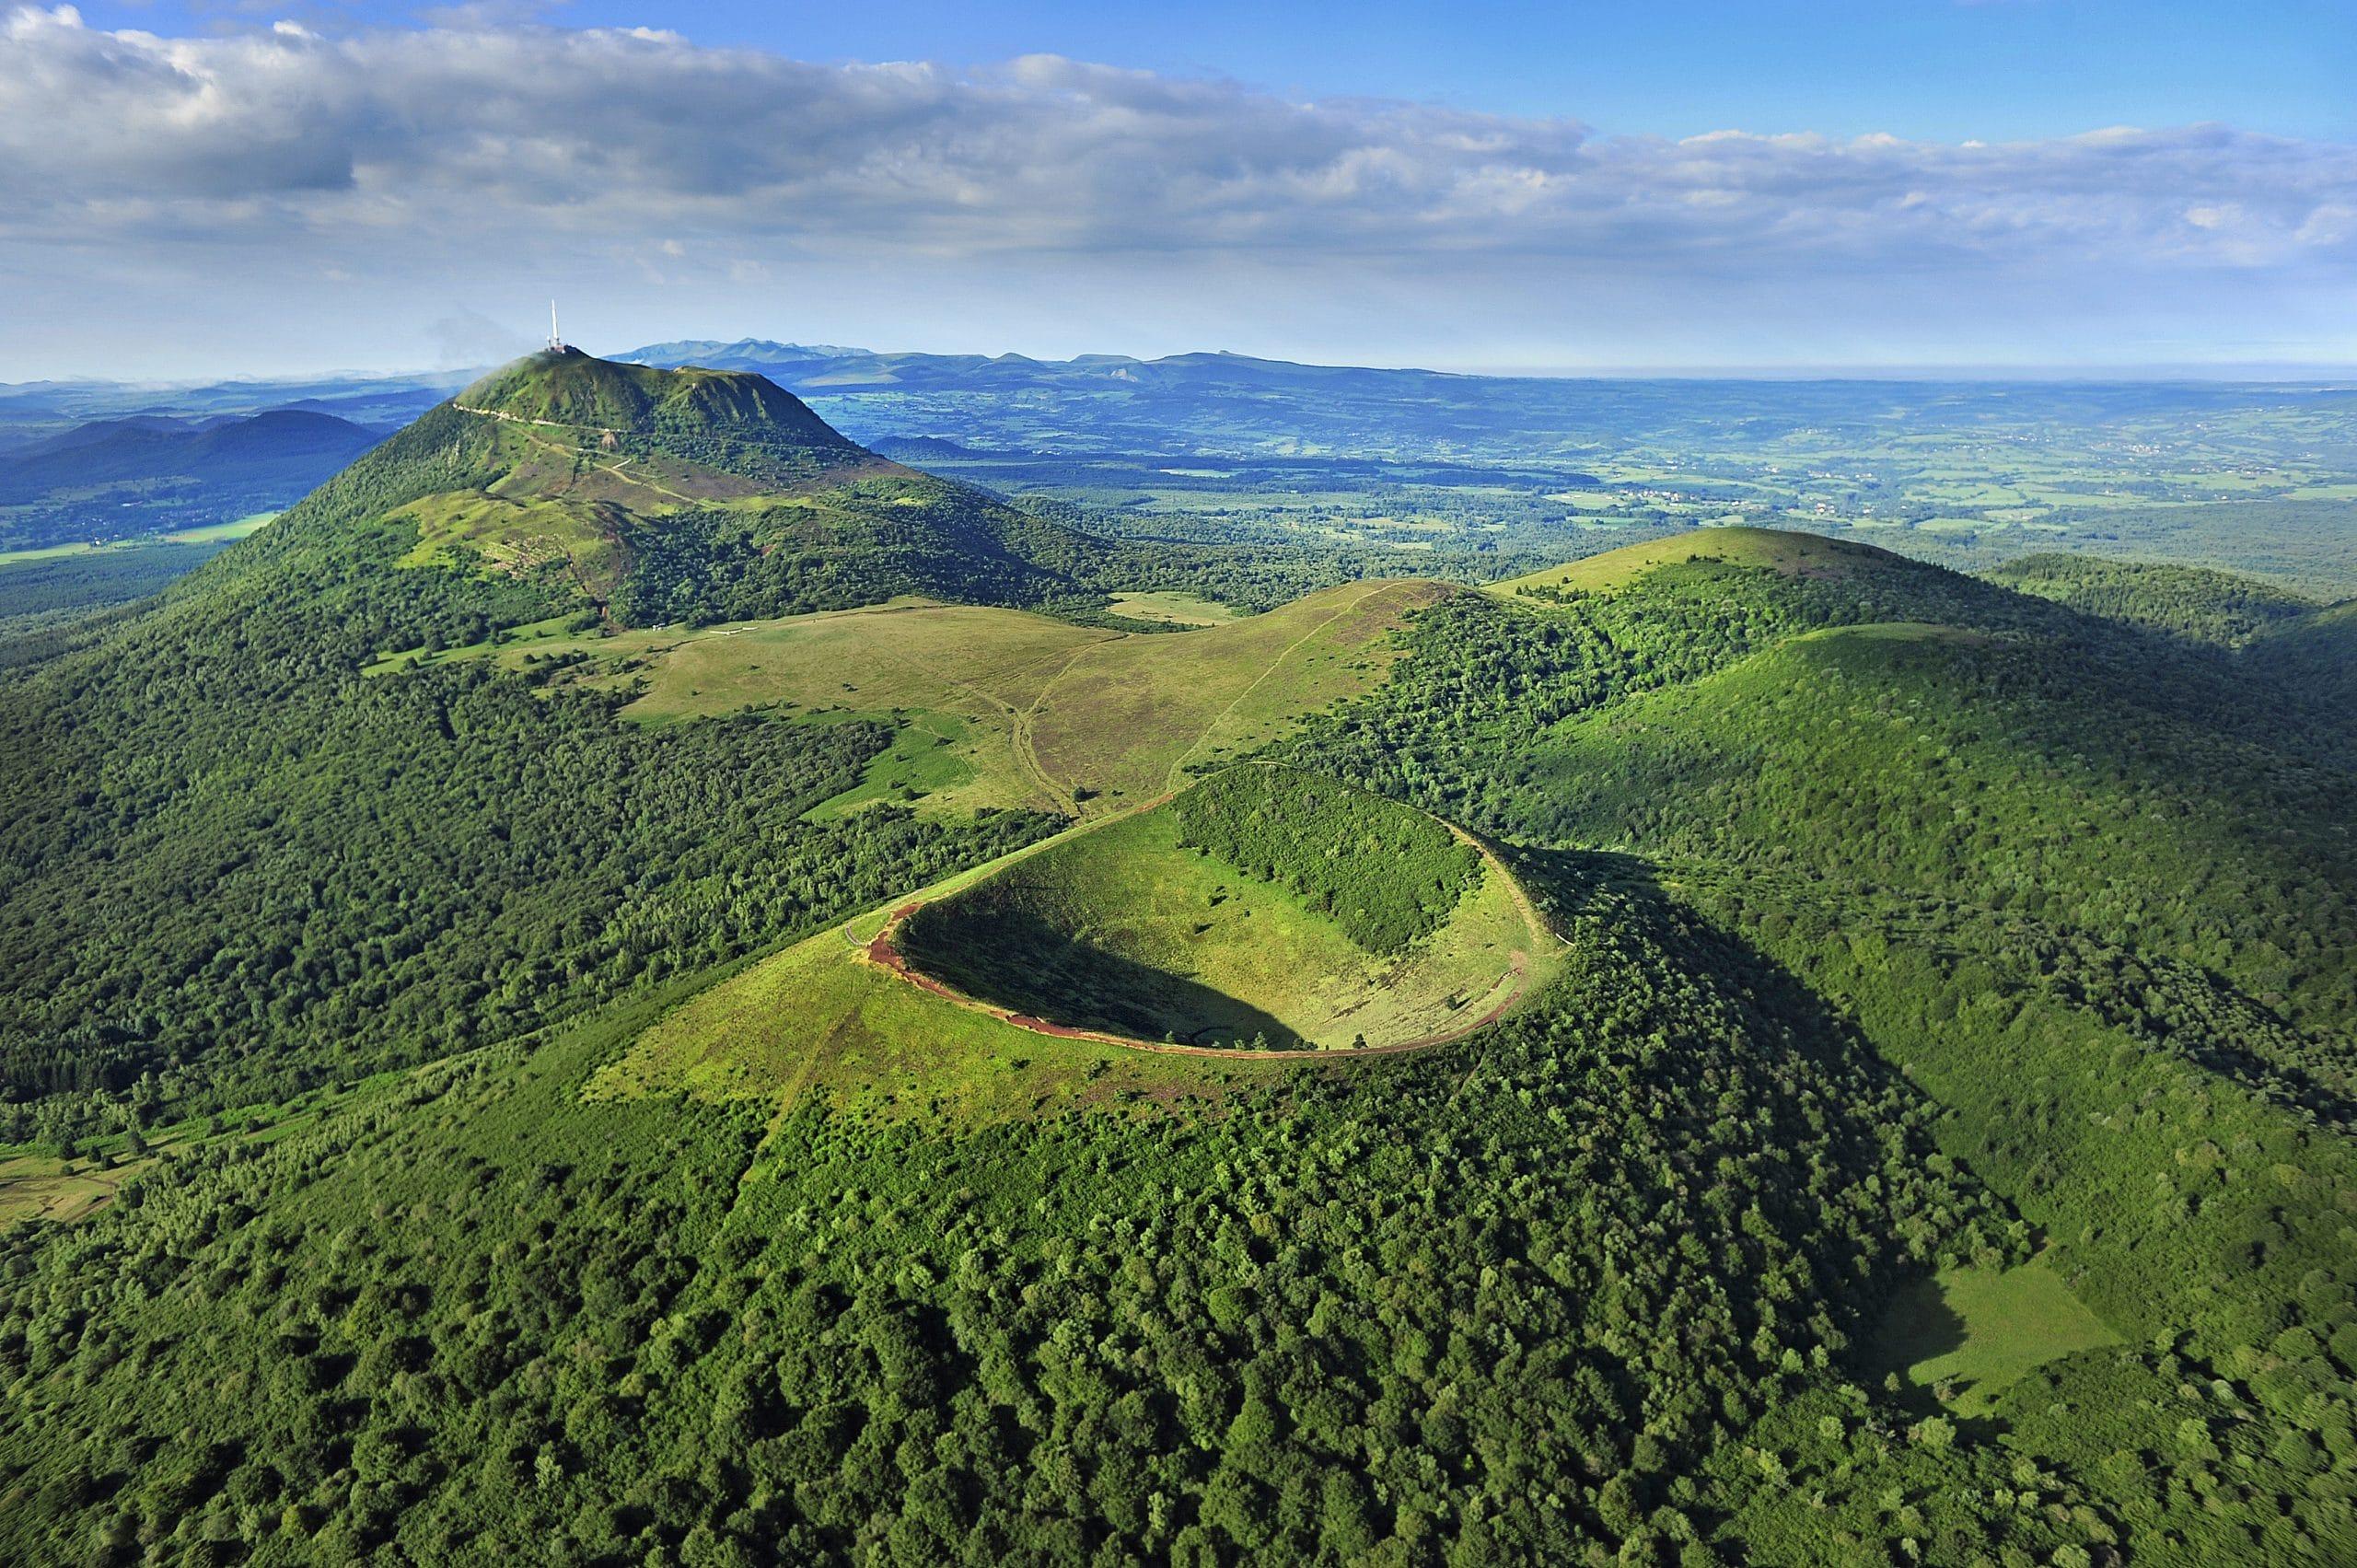 The Chaîne des Puys joins the Unesco World Heritage List